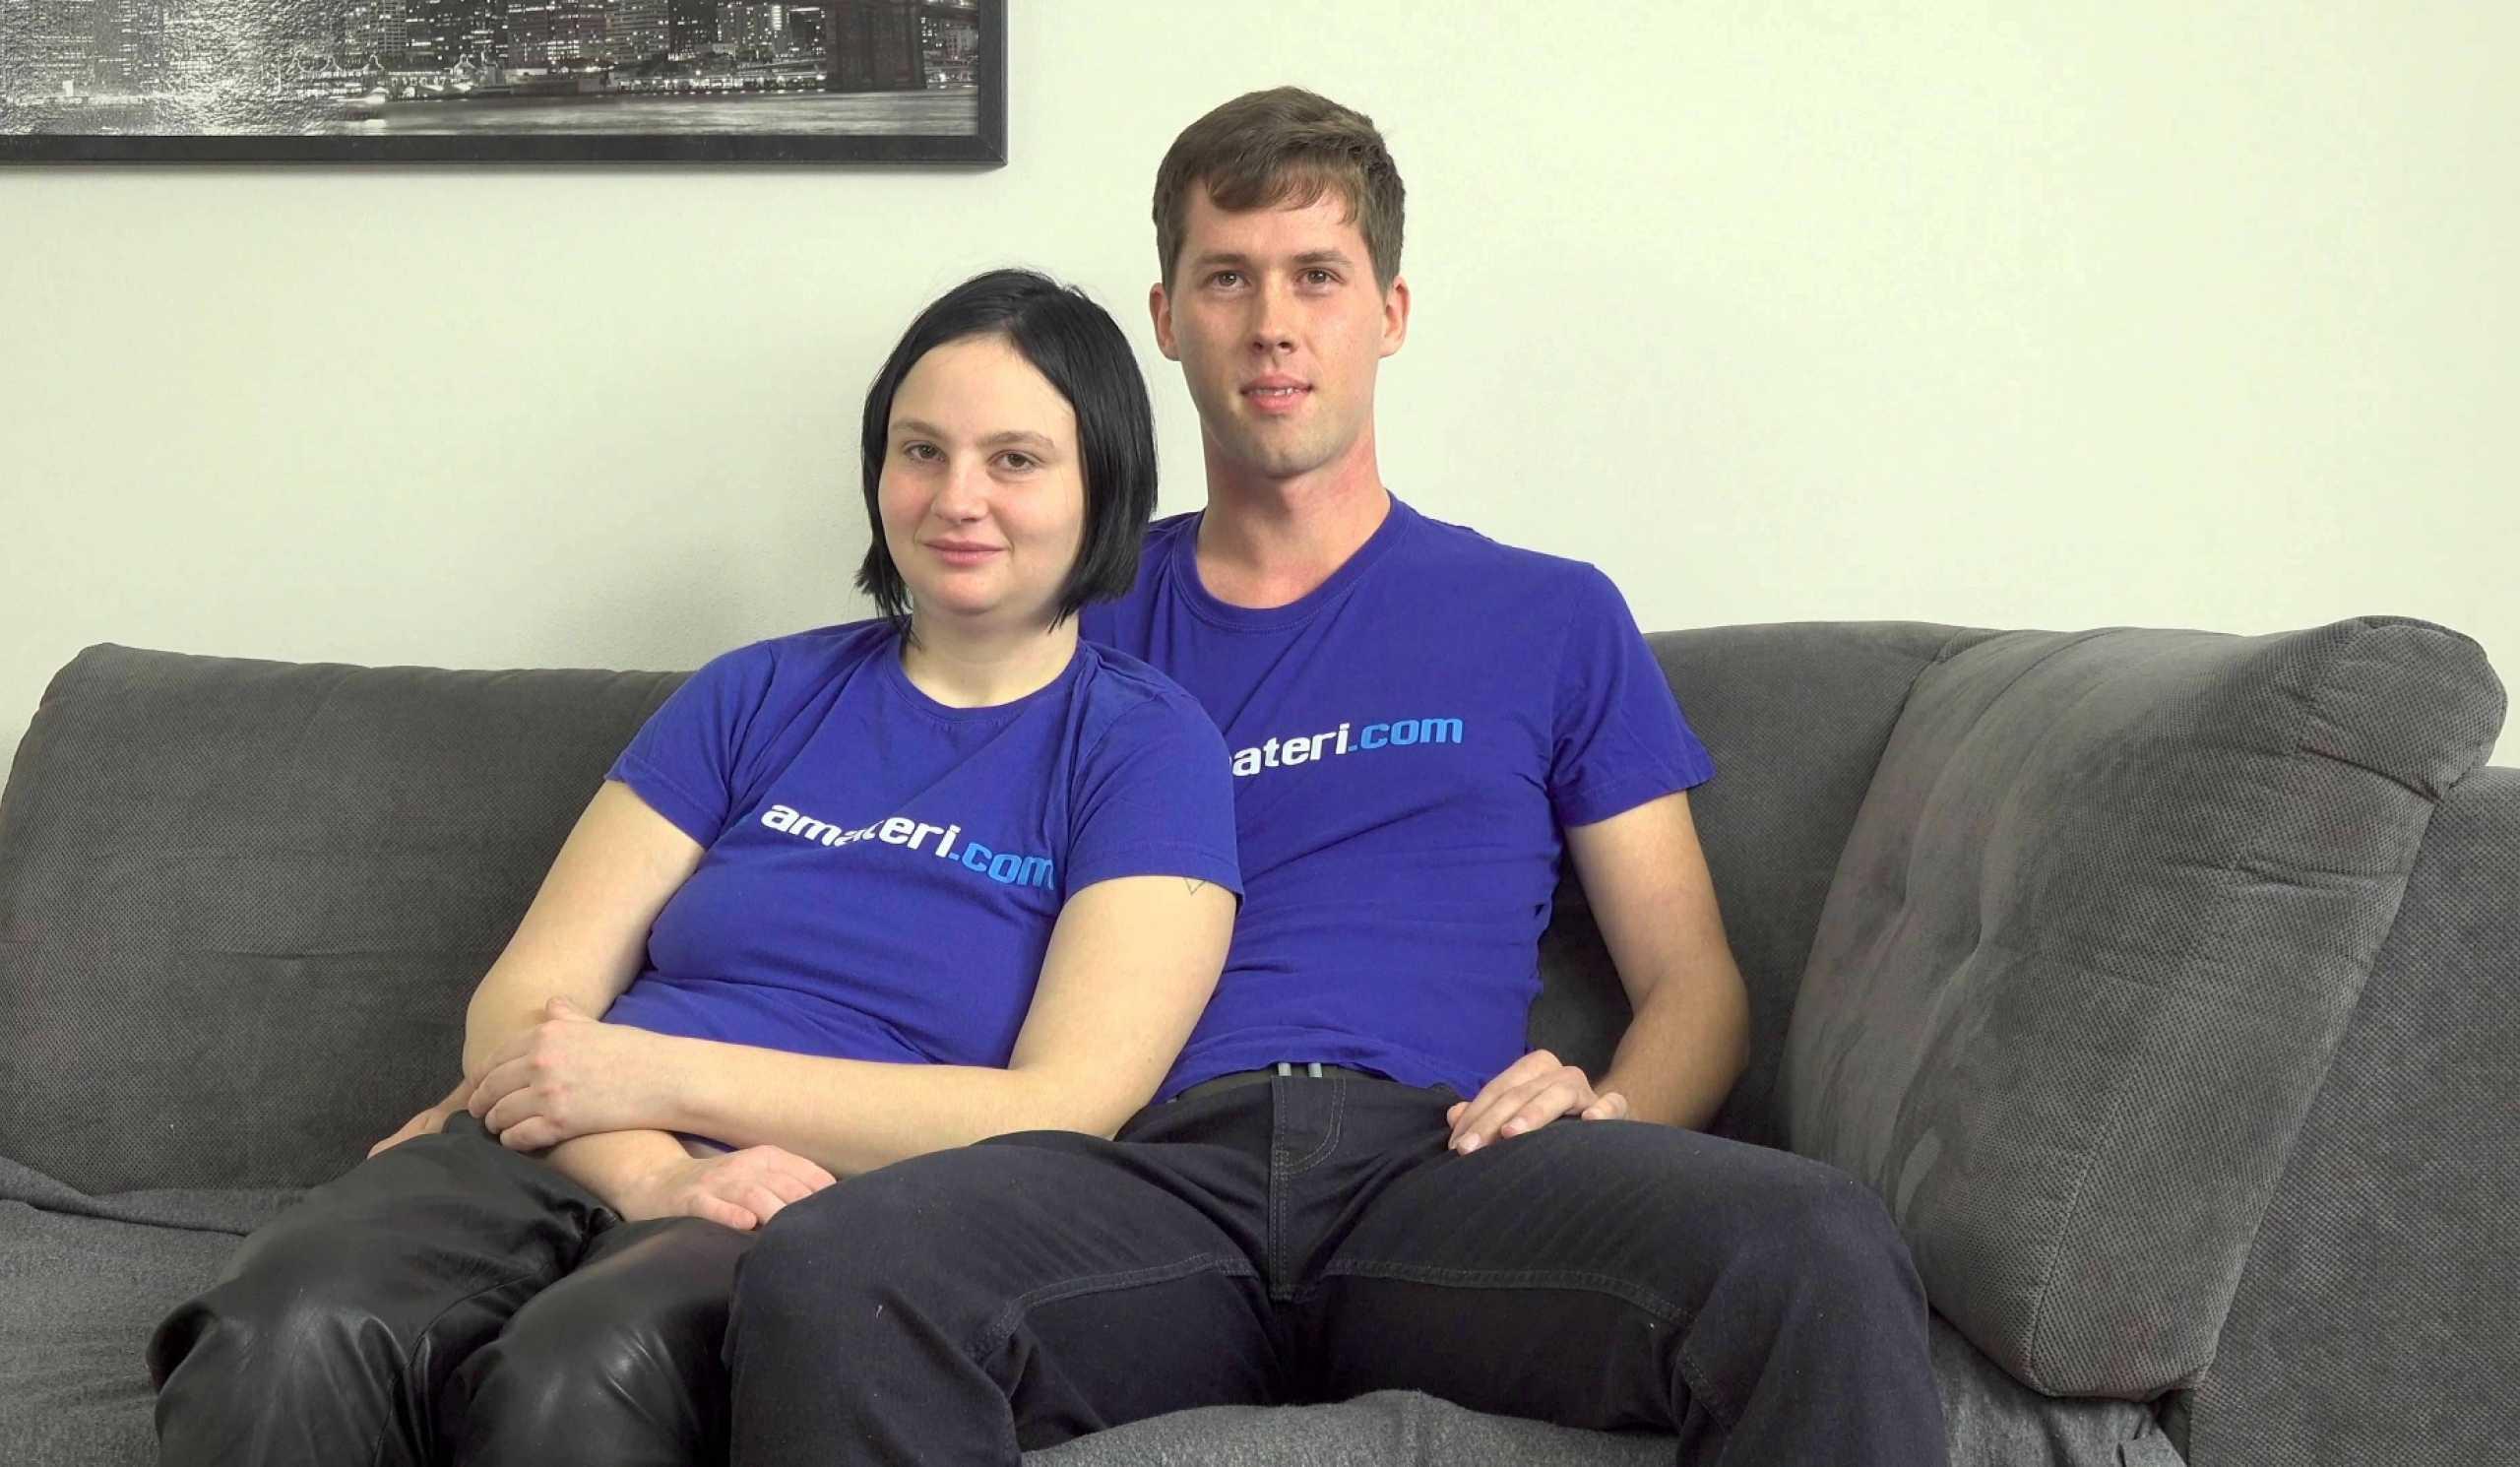 [AmateriPremium] (Jana P.) (Shy amateur couple shows their sex skills / 02.17.2020)